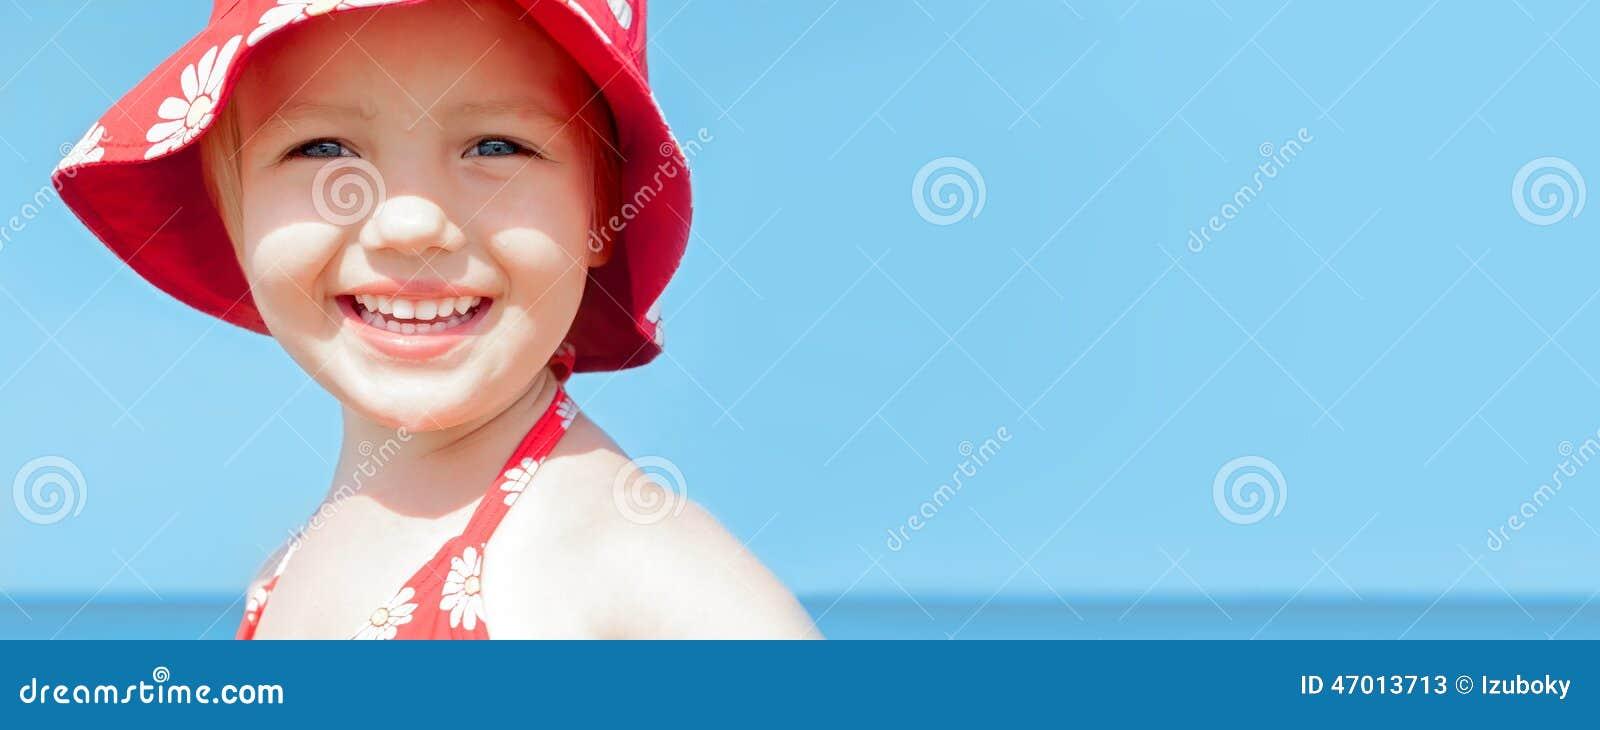 Summer banner child girl happy smile sea holidays